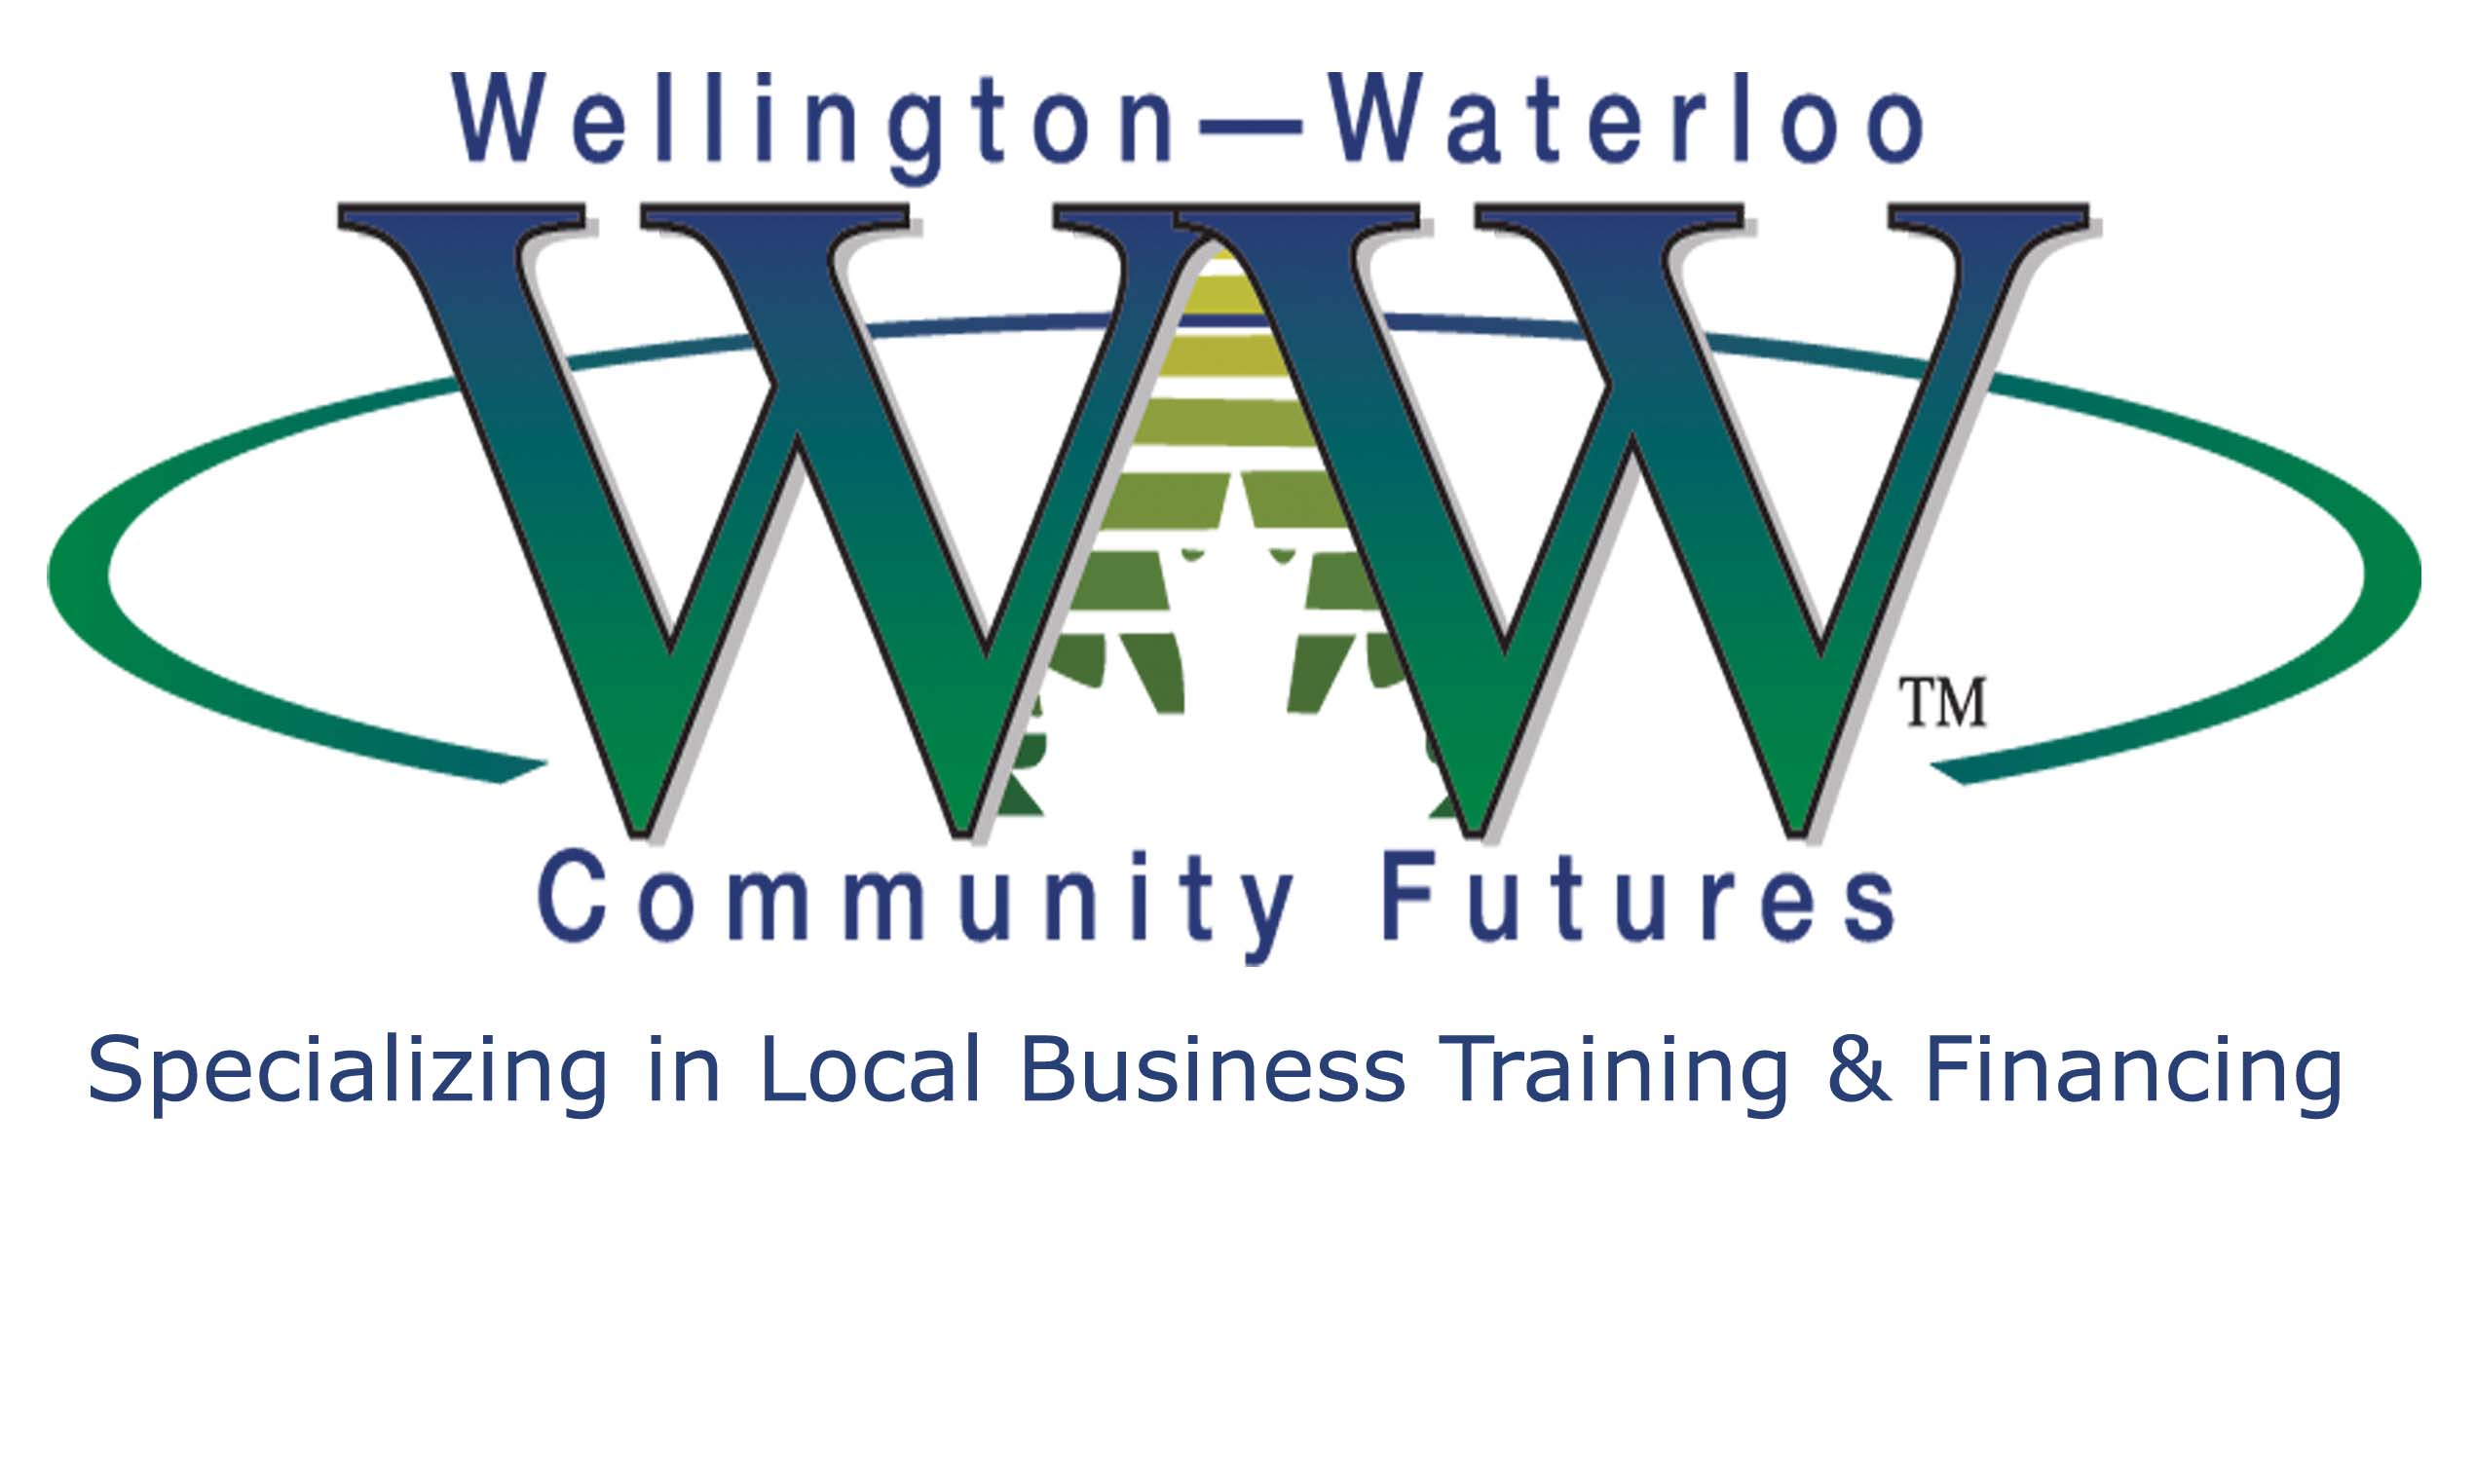 WWCFDC